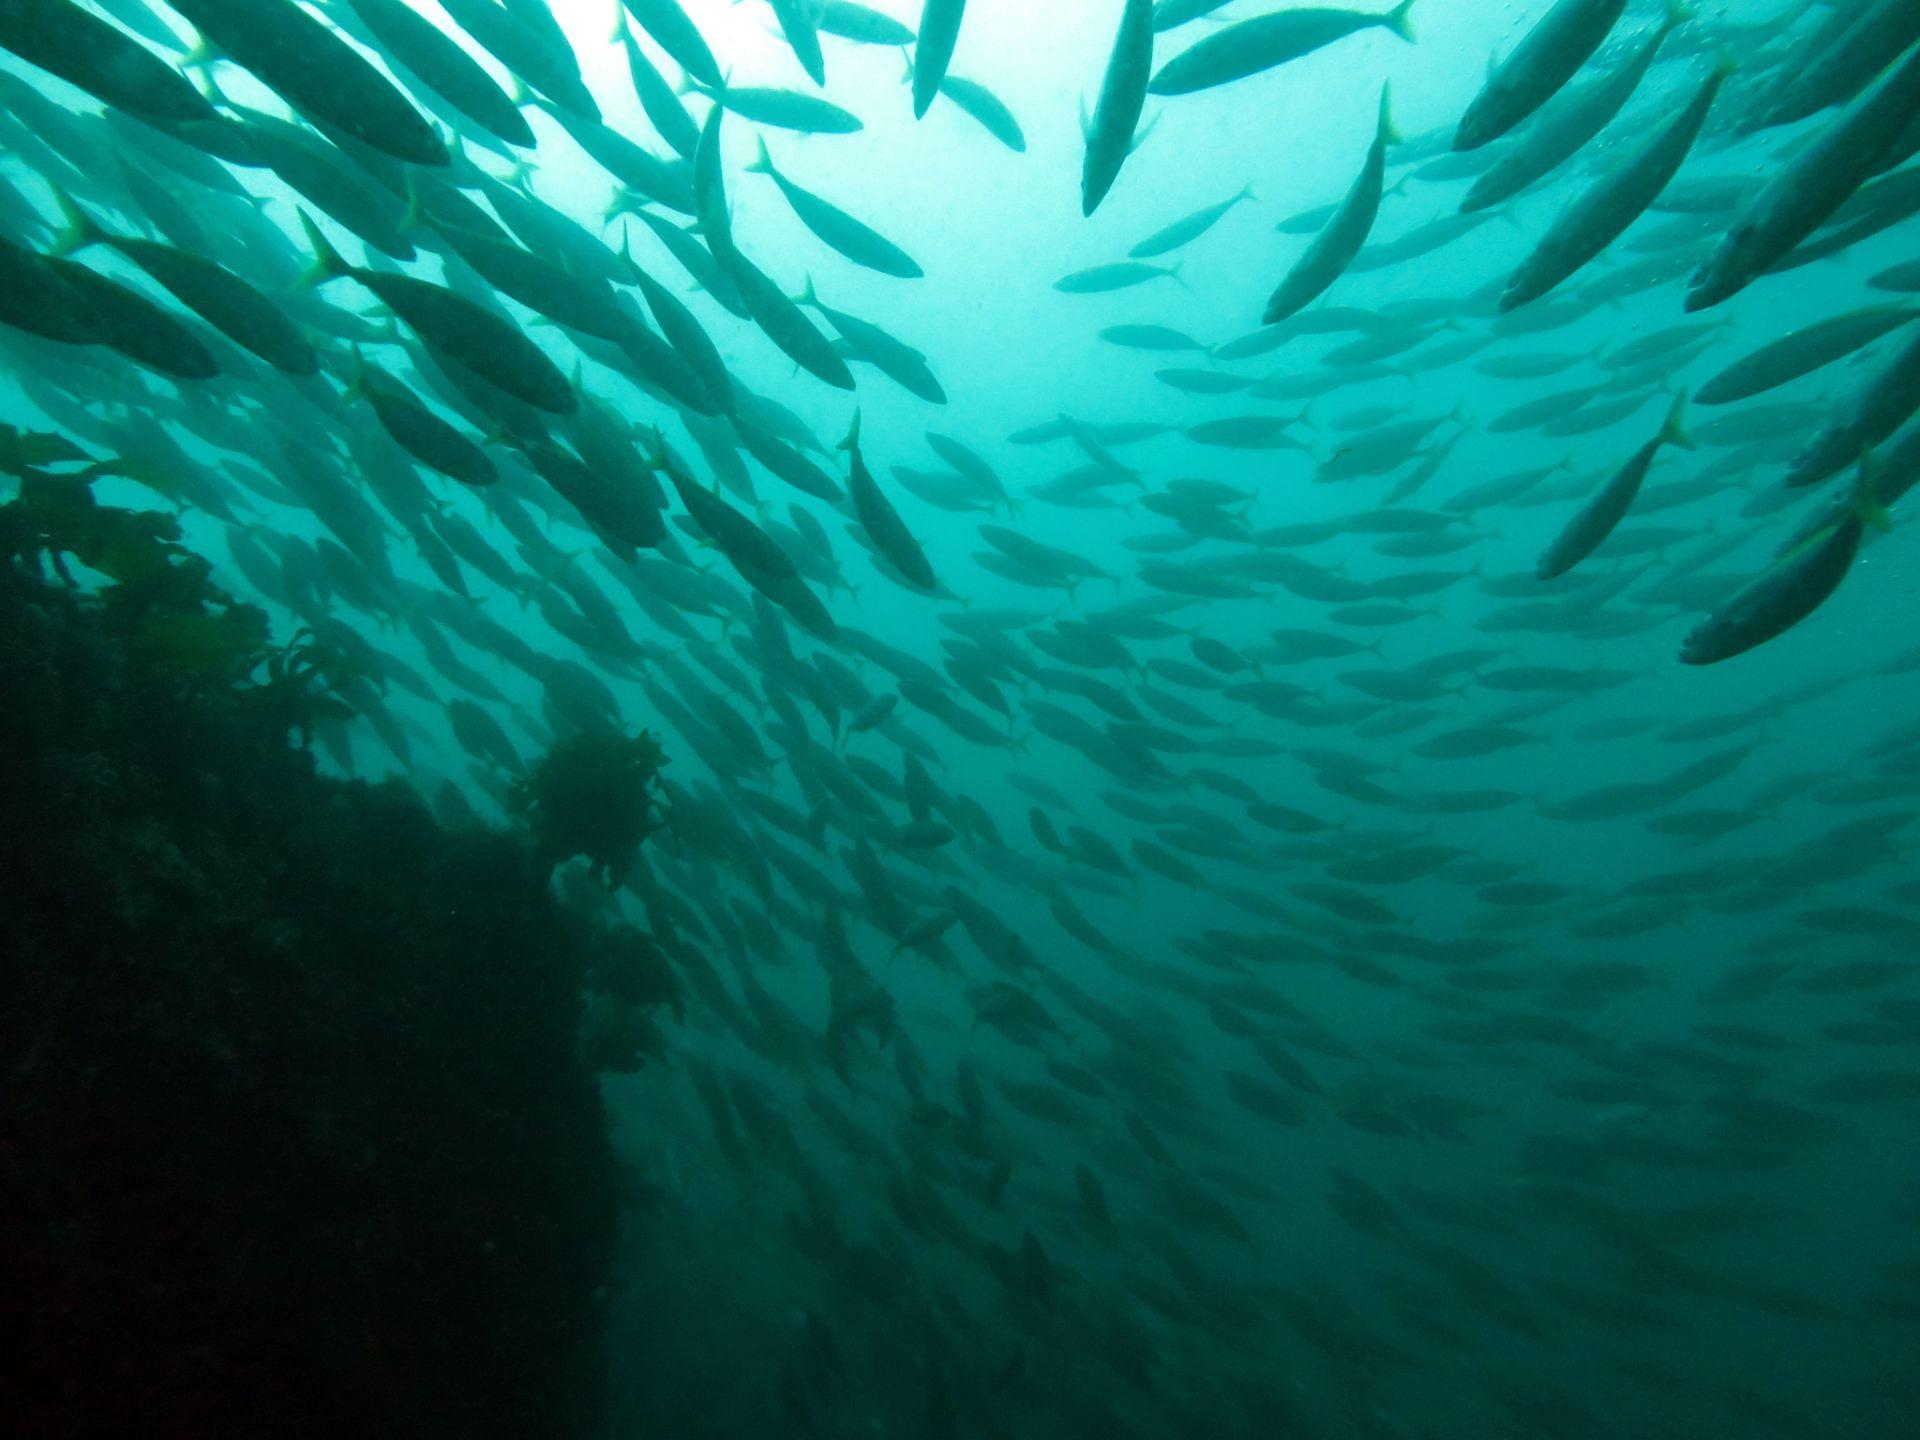 A school of koheru fish silhouetted in greenish water